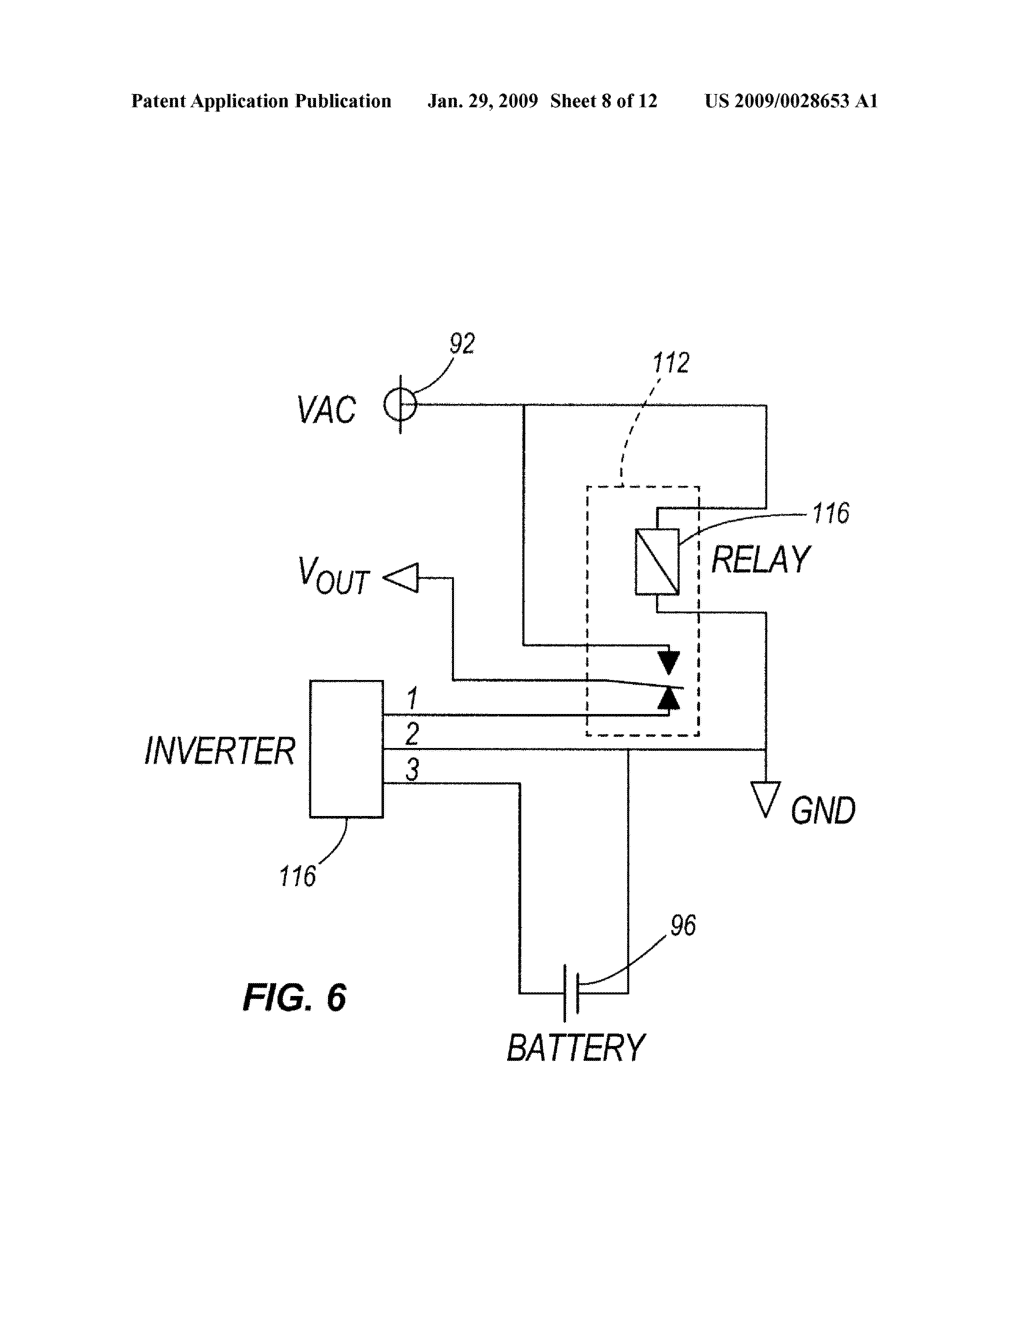 ac dc magnetic drill press diagram, schematic, and image 09 Diagram Air Circuit Braker